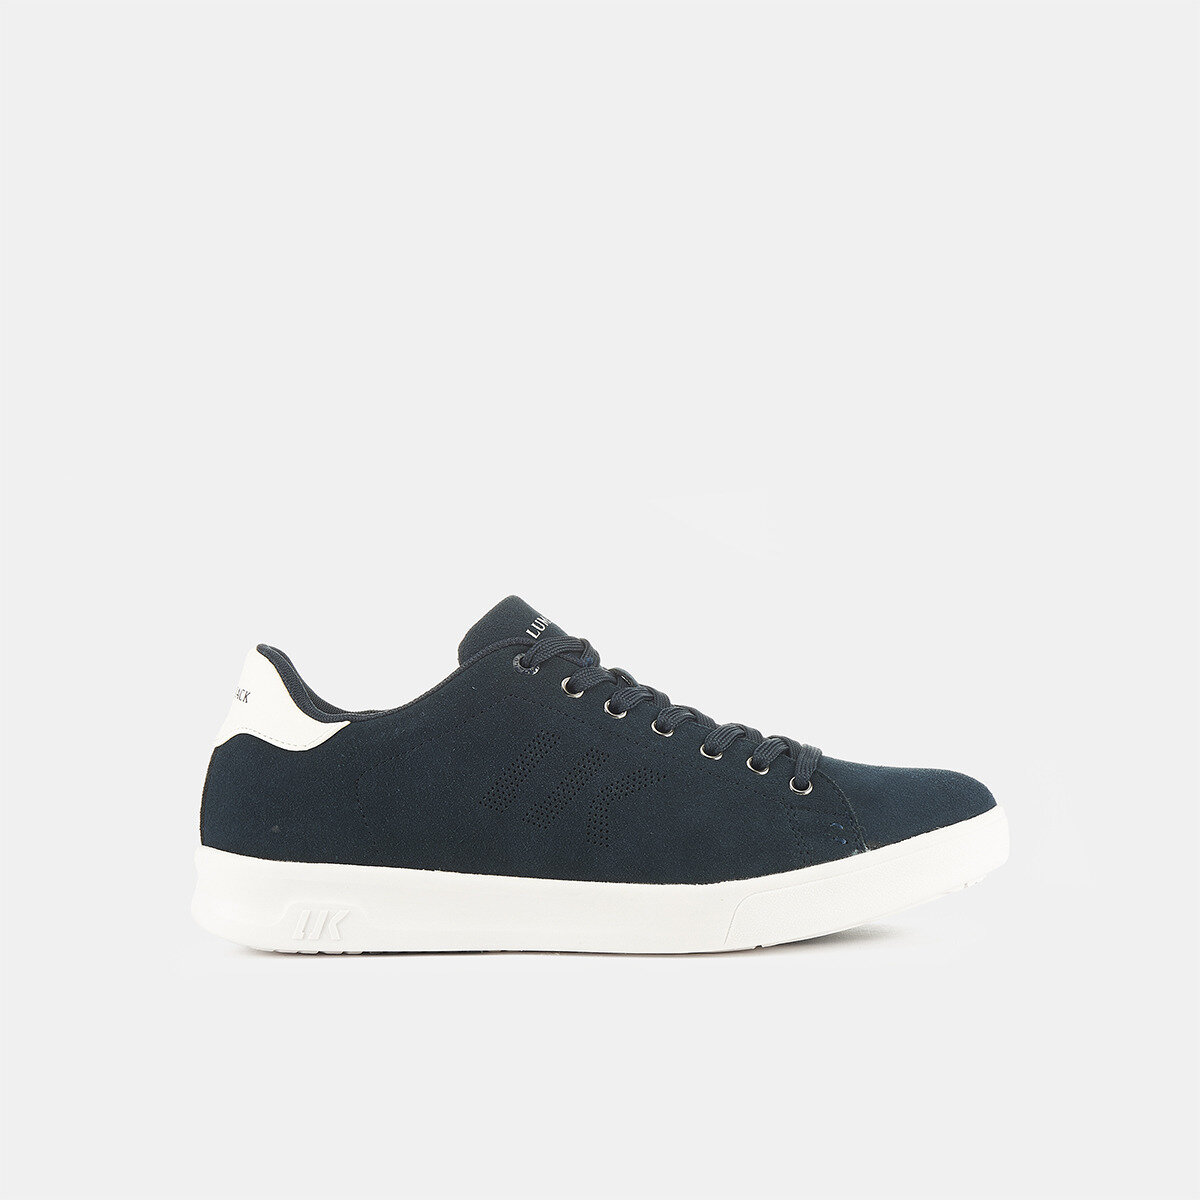 HAWK NAVY BLUE Man Sneakers